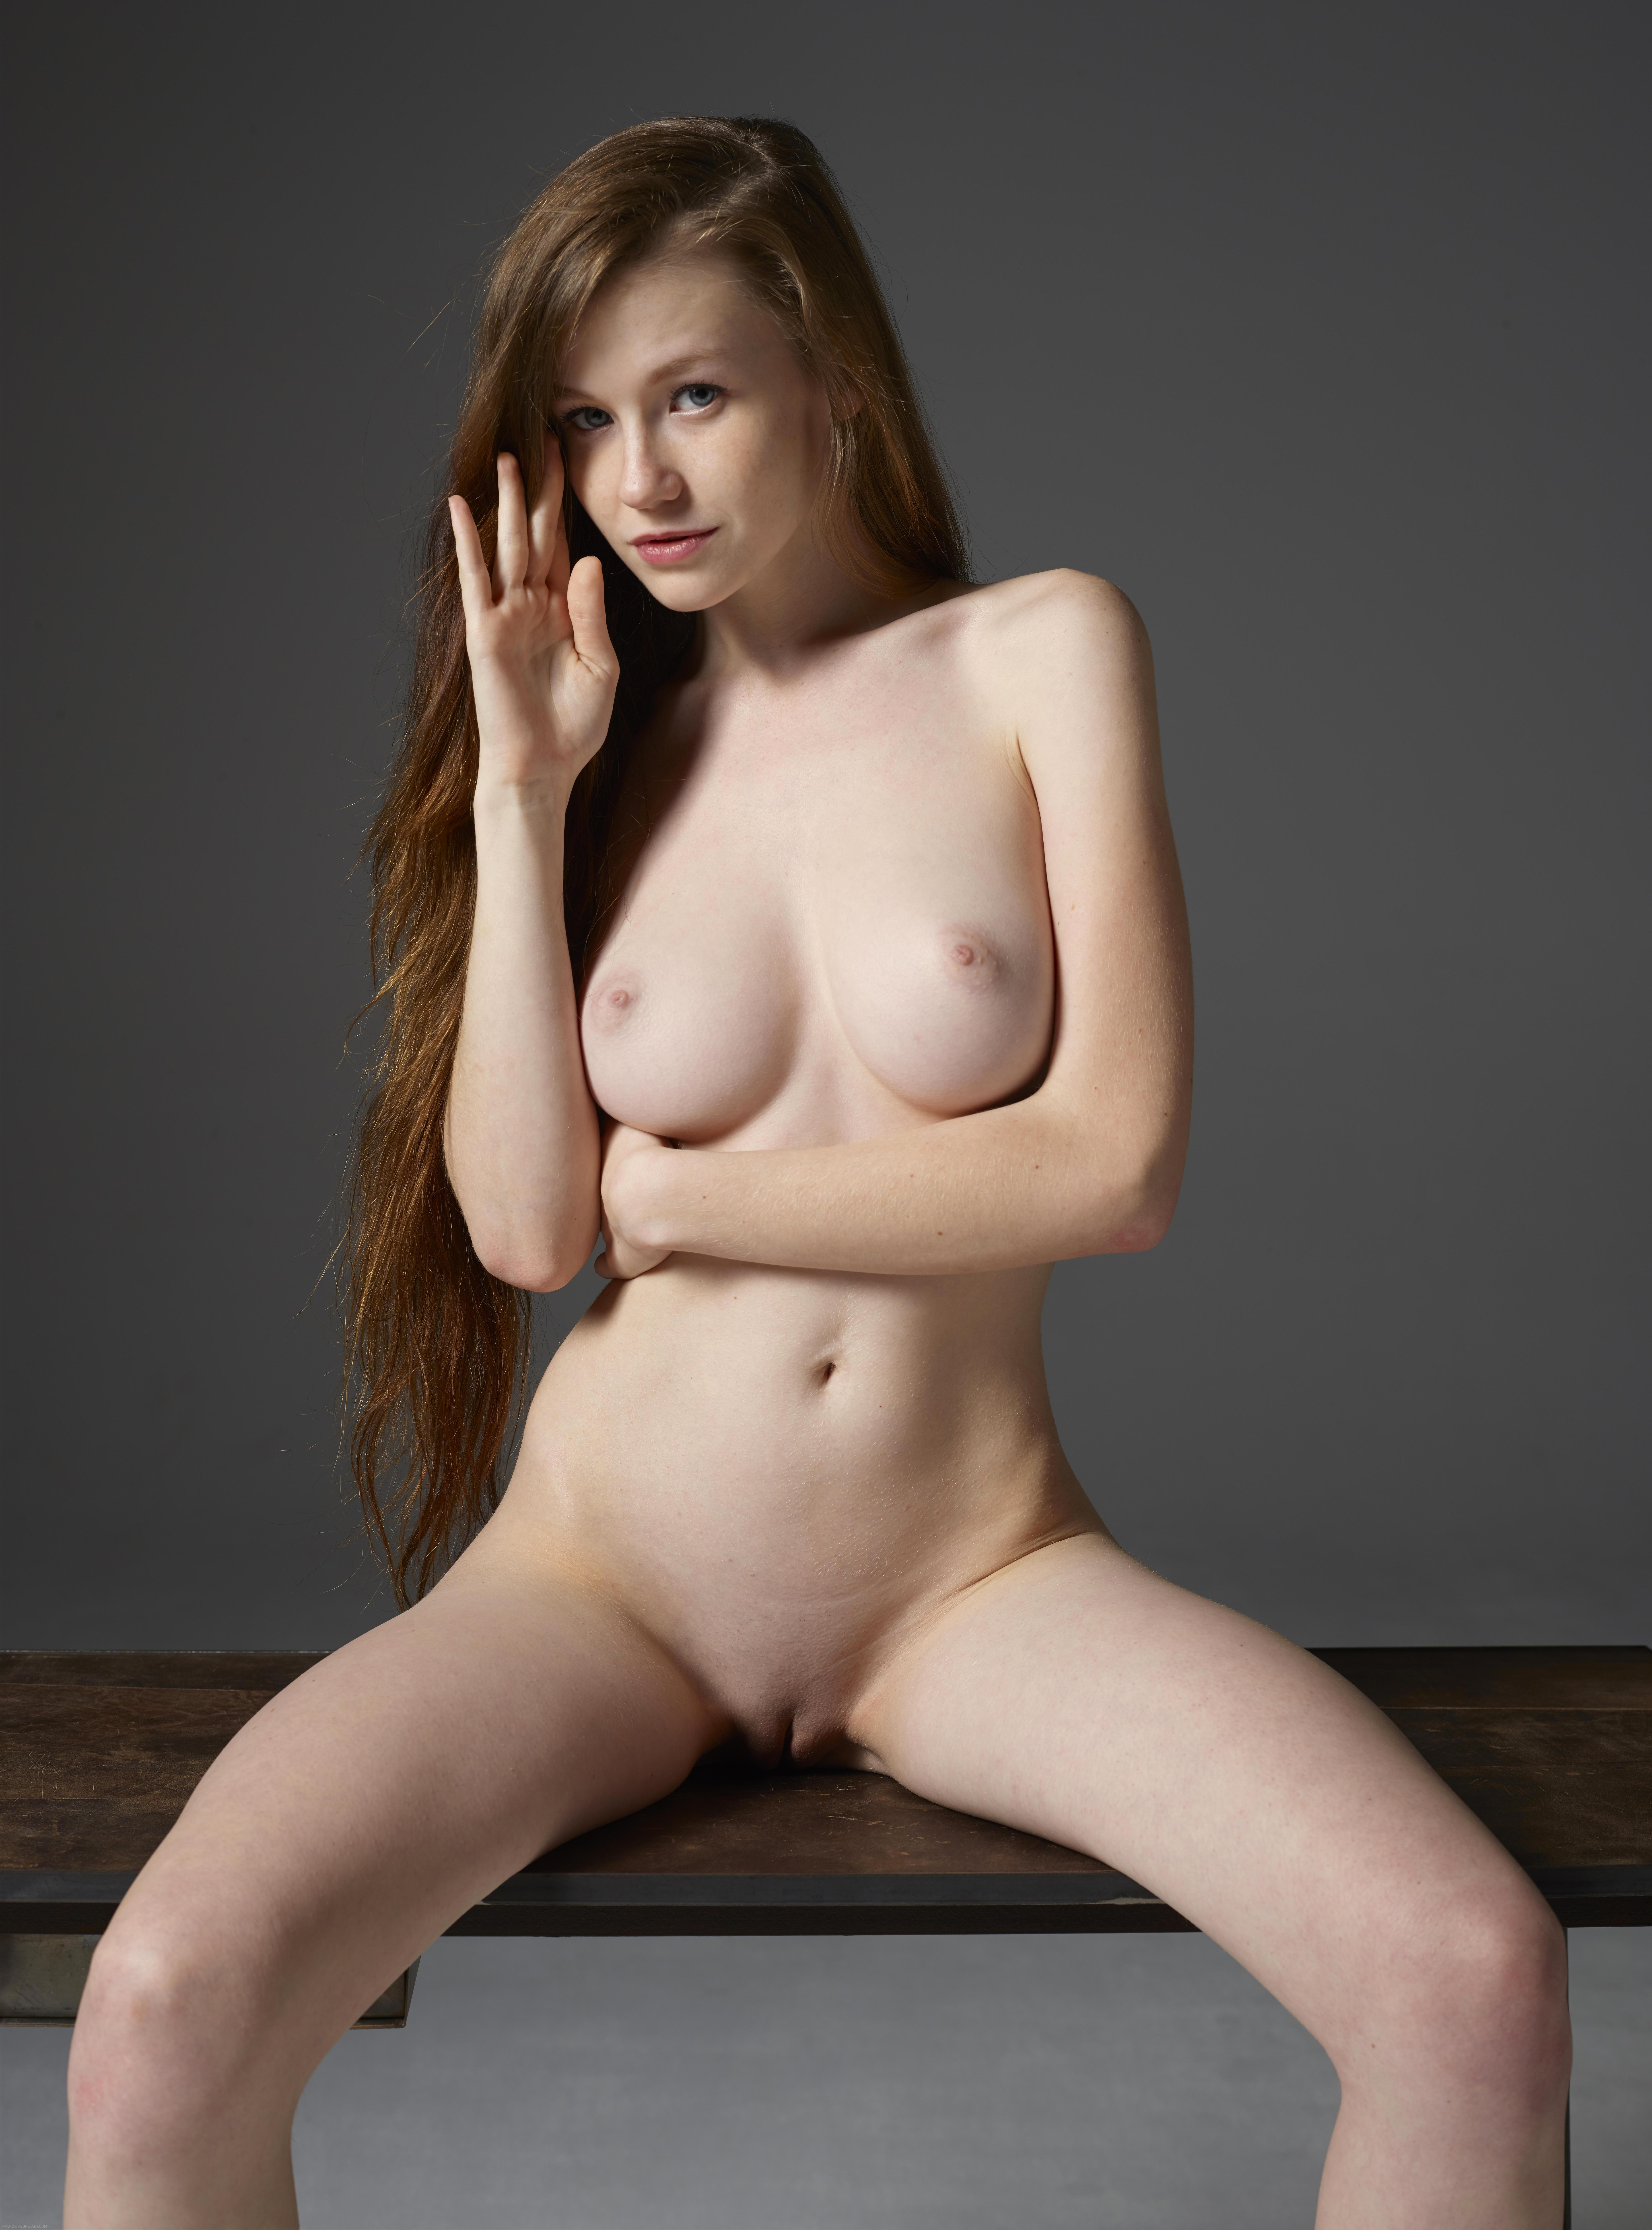 Emily foxler nude